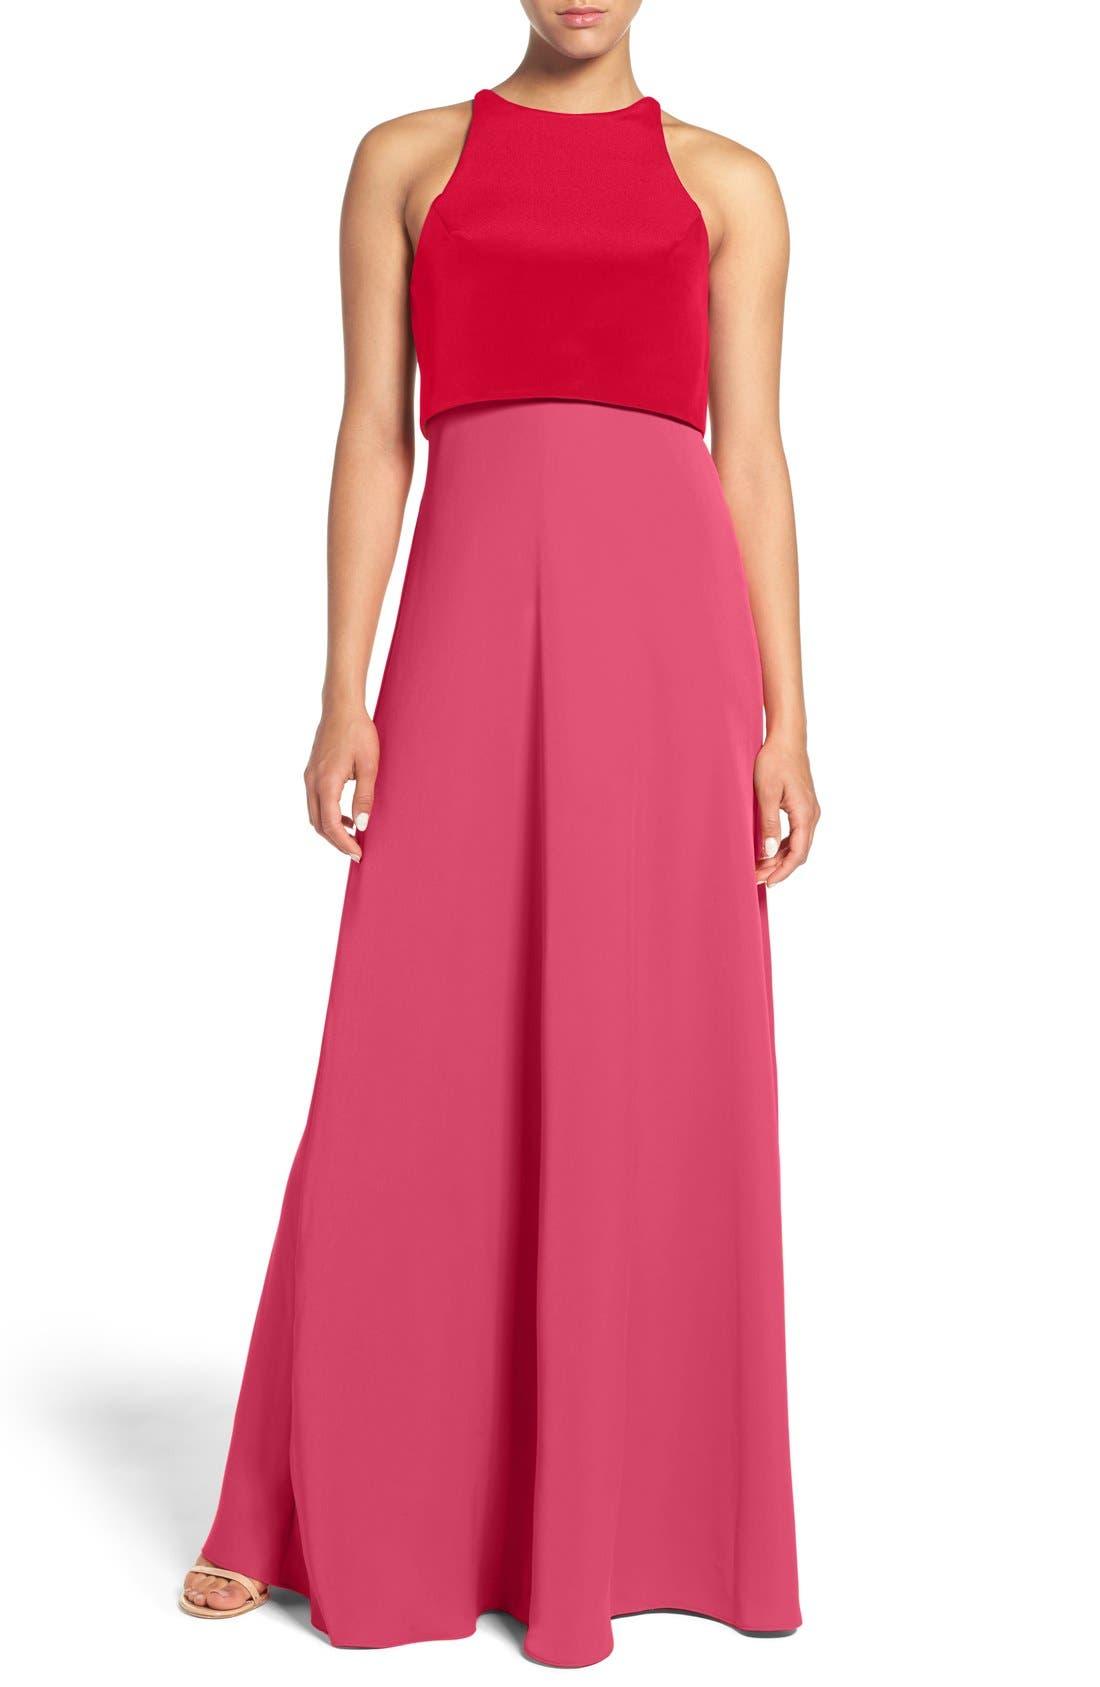 Alternate Image 1 Selected - Jill Jill Stuart Colorblock Popover Crepe Gown